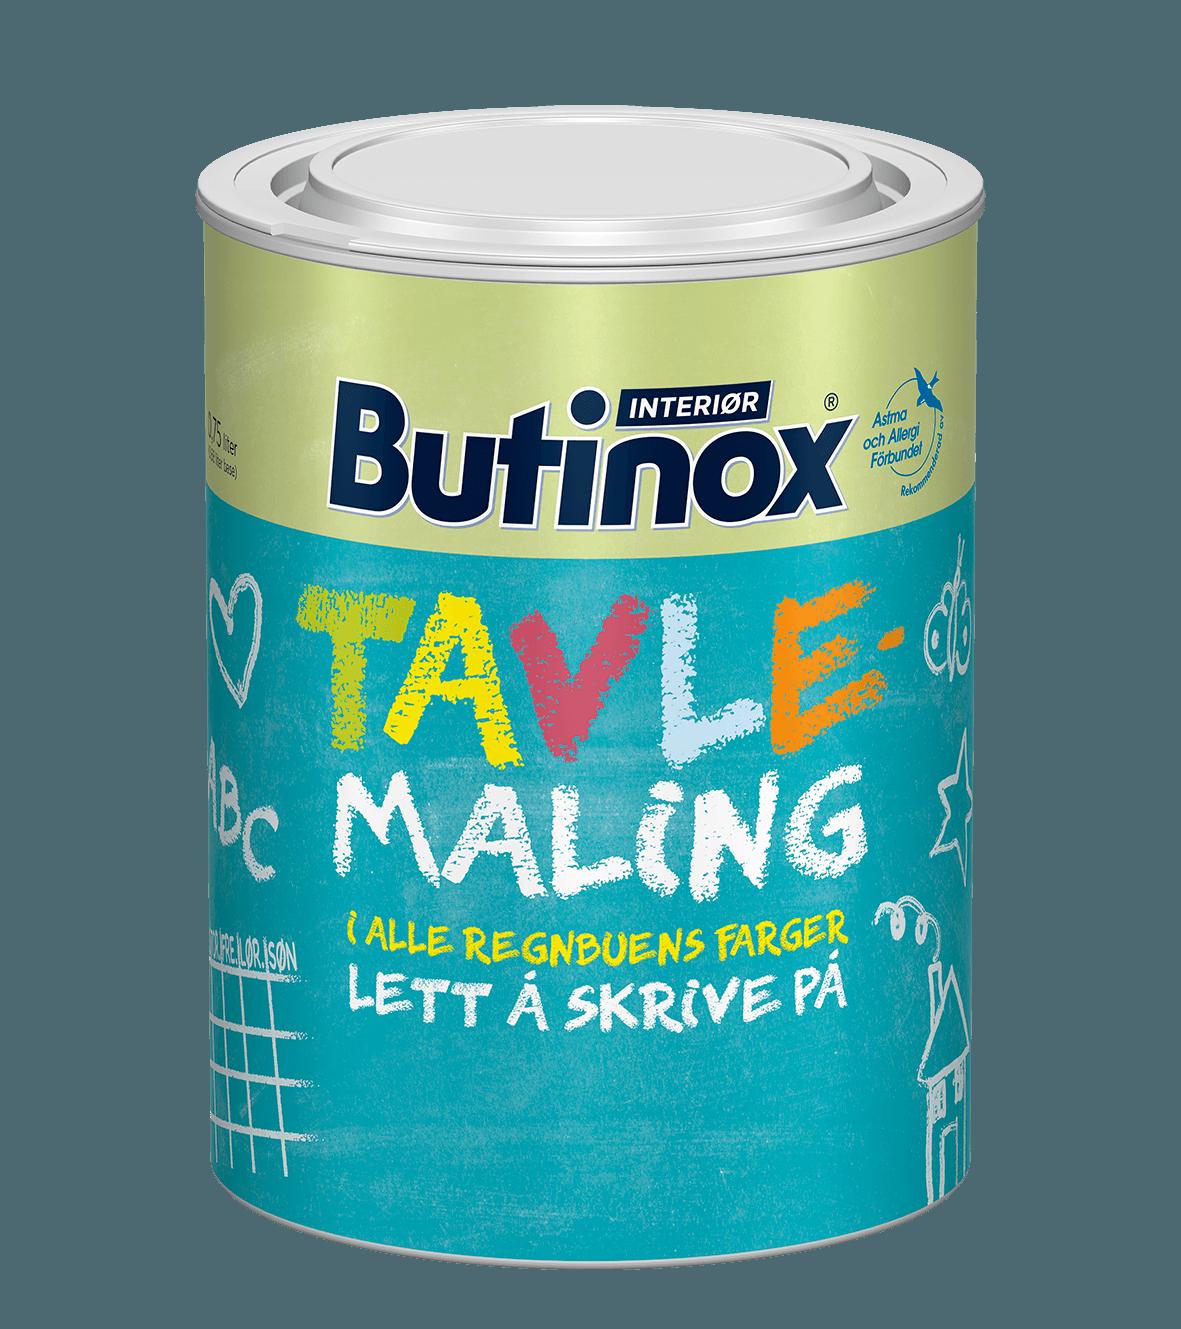 0,65L_Butinox_Interioer-Tavlemaling_Lavopploest